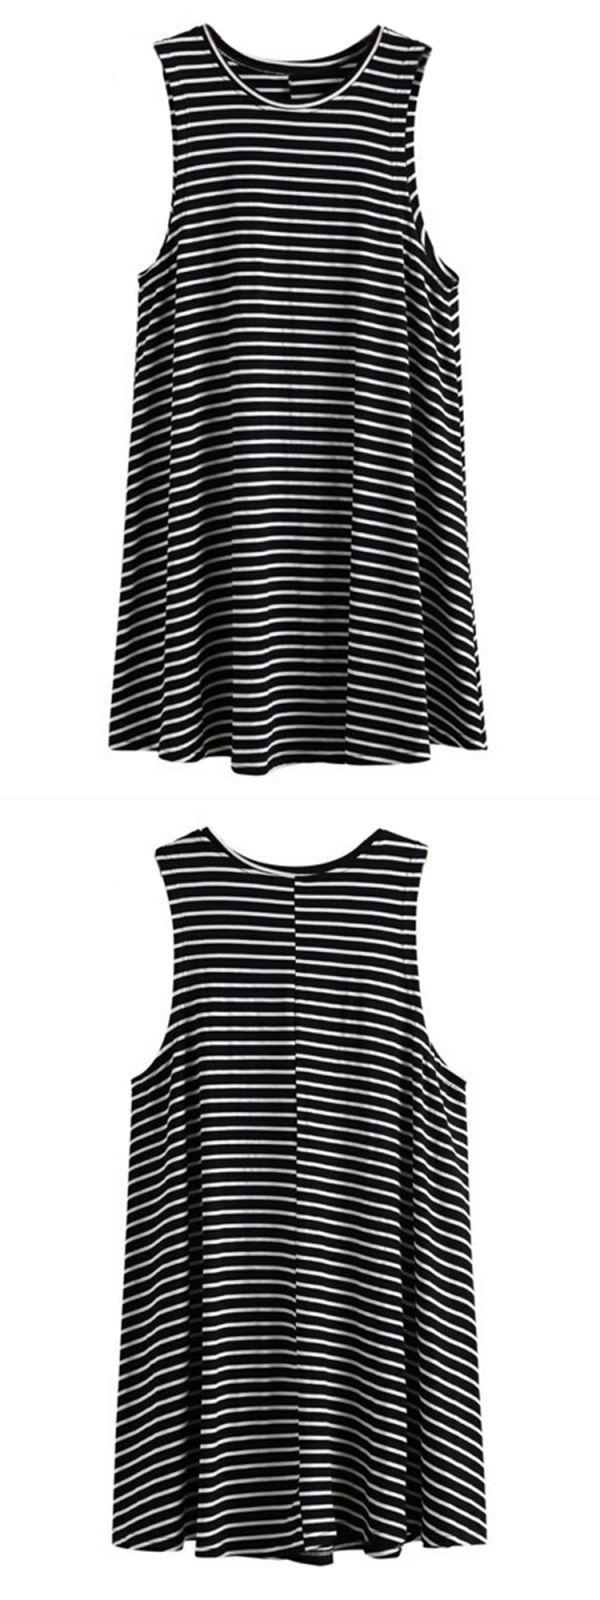 Casual dresses neiman marcus women loose sleeveless round neck